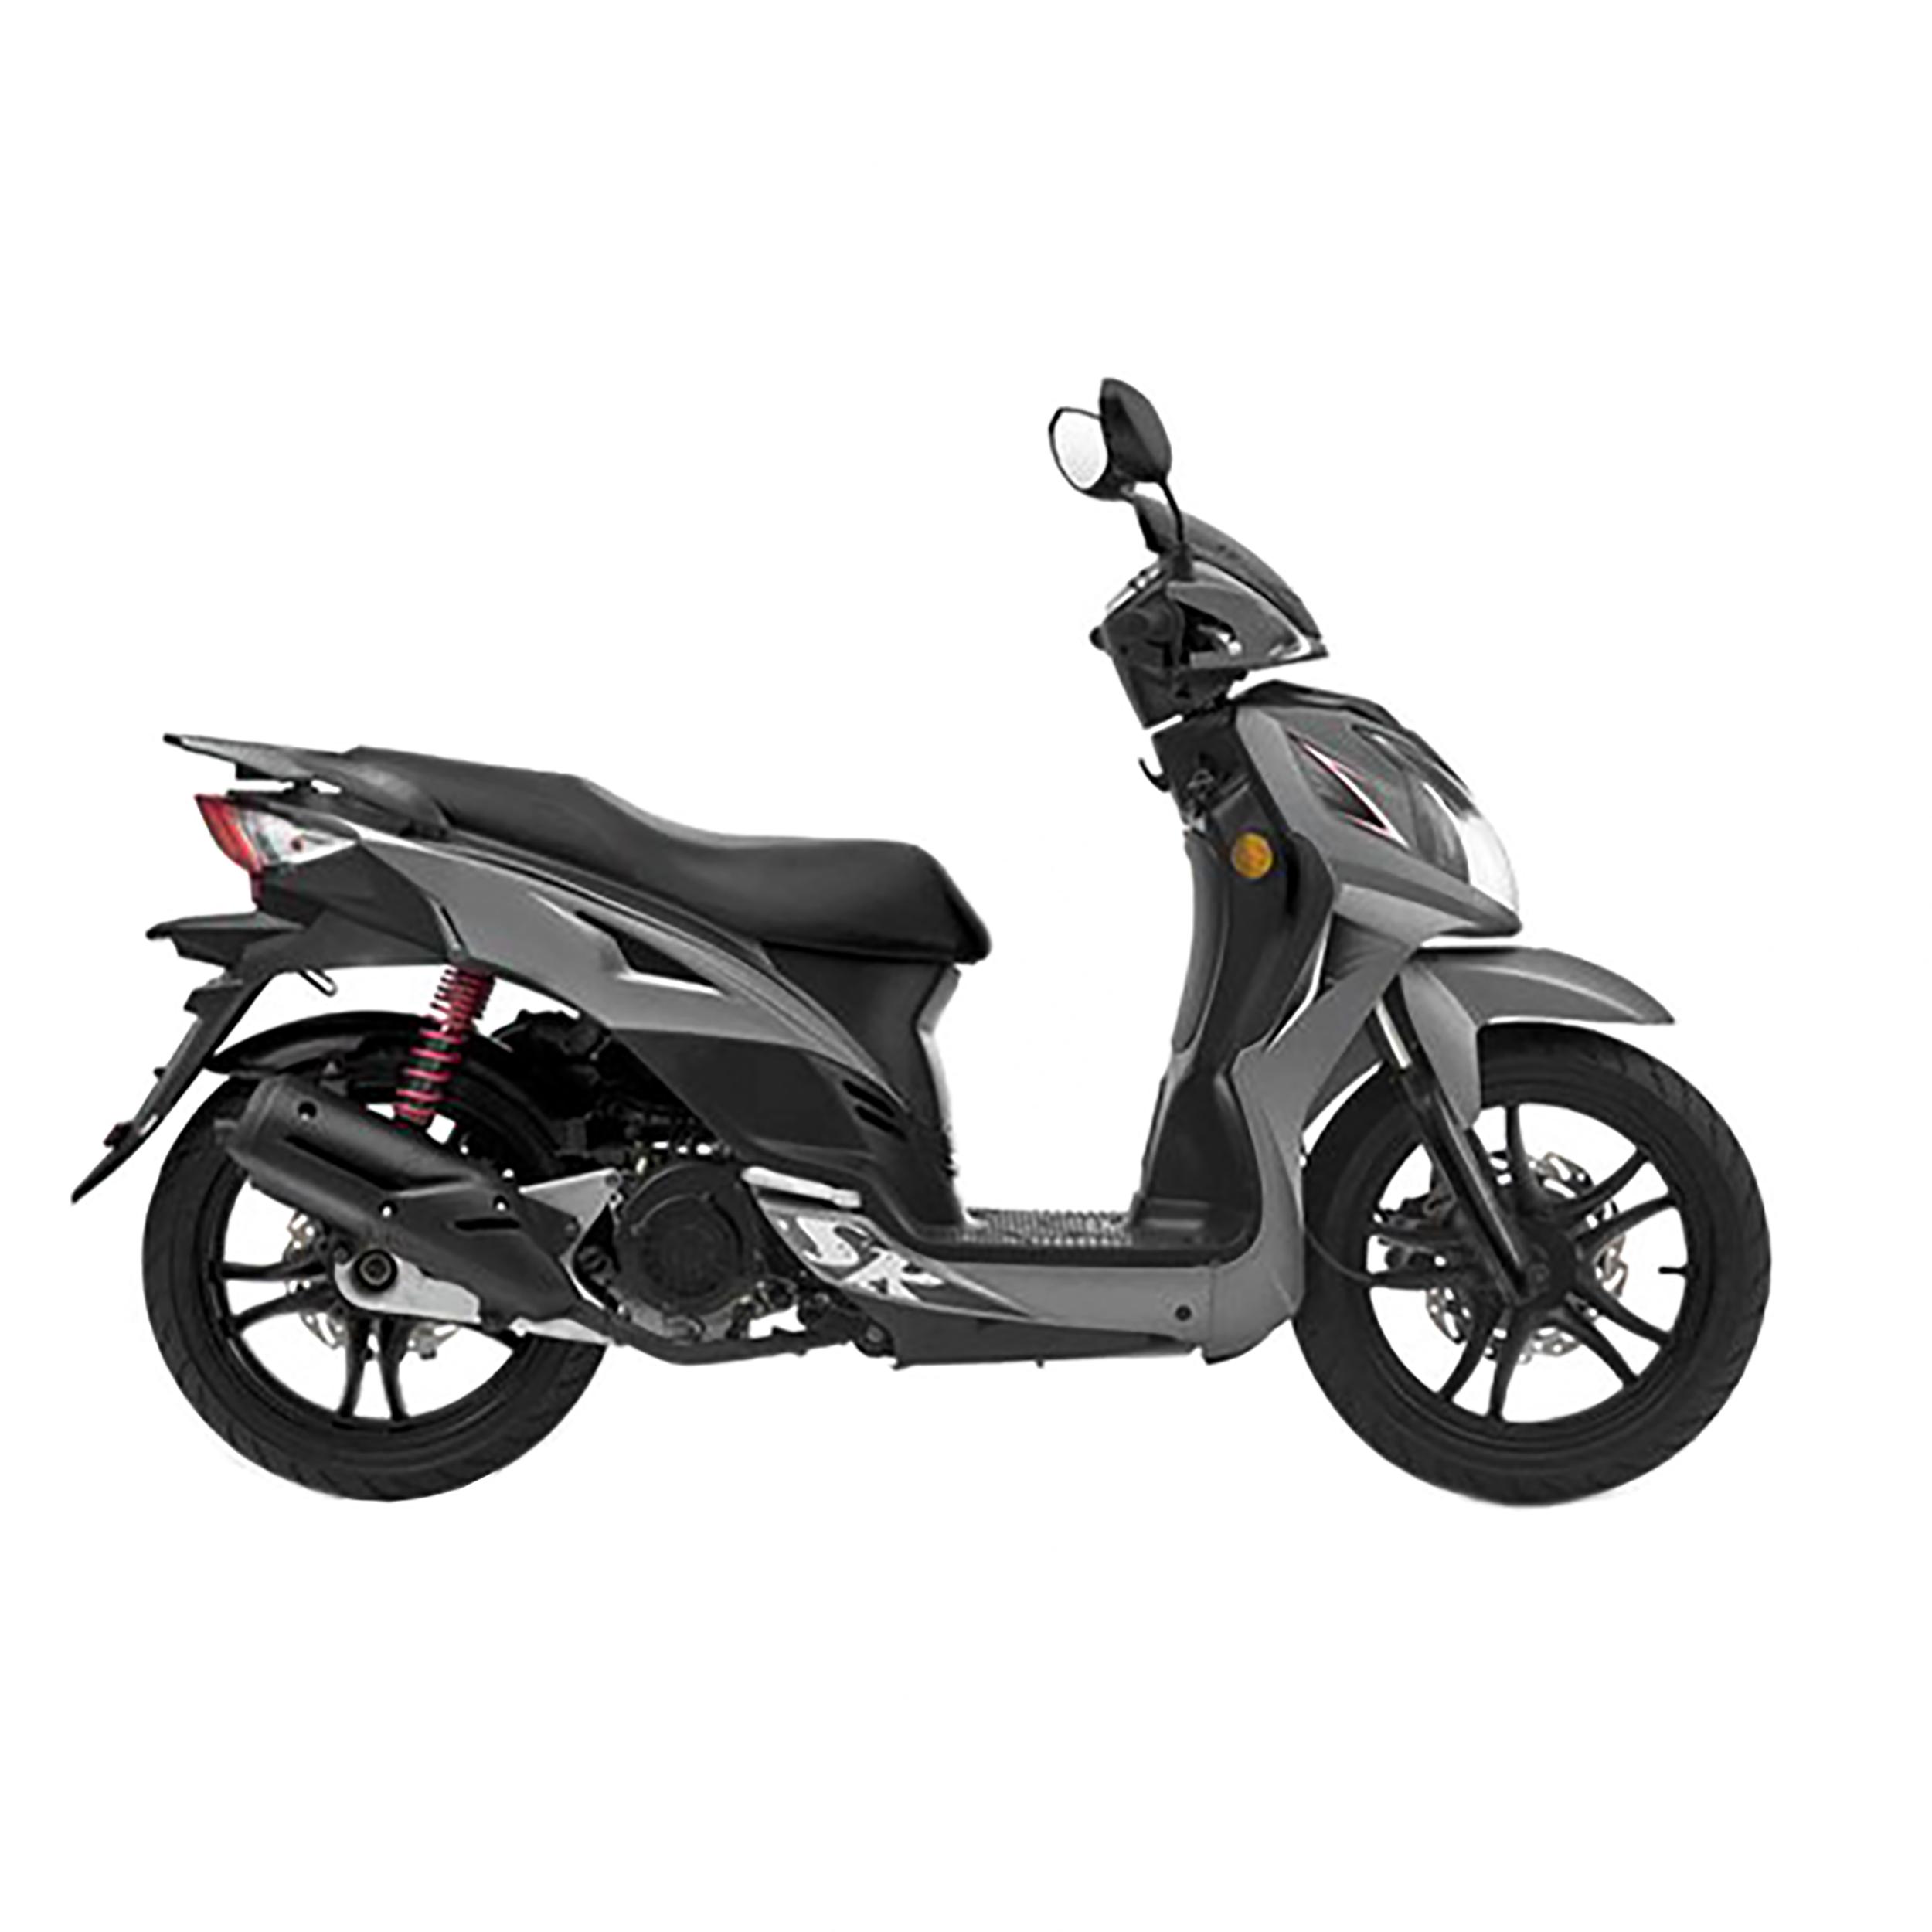 موتورسیکلت گلکسی مدل اس آر 200 سی سی سال 1398